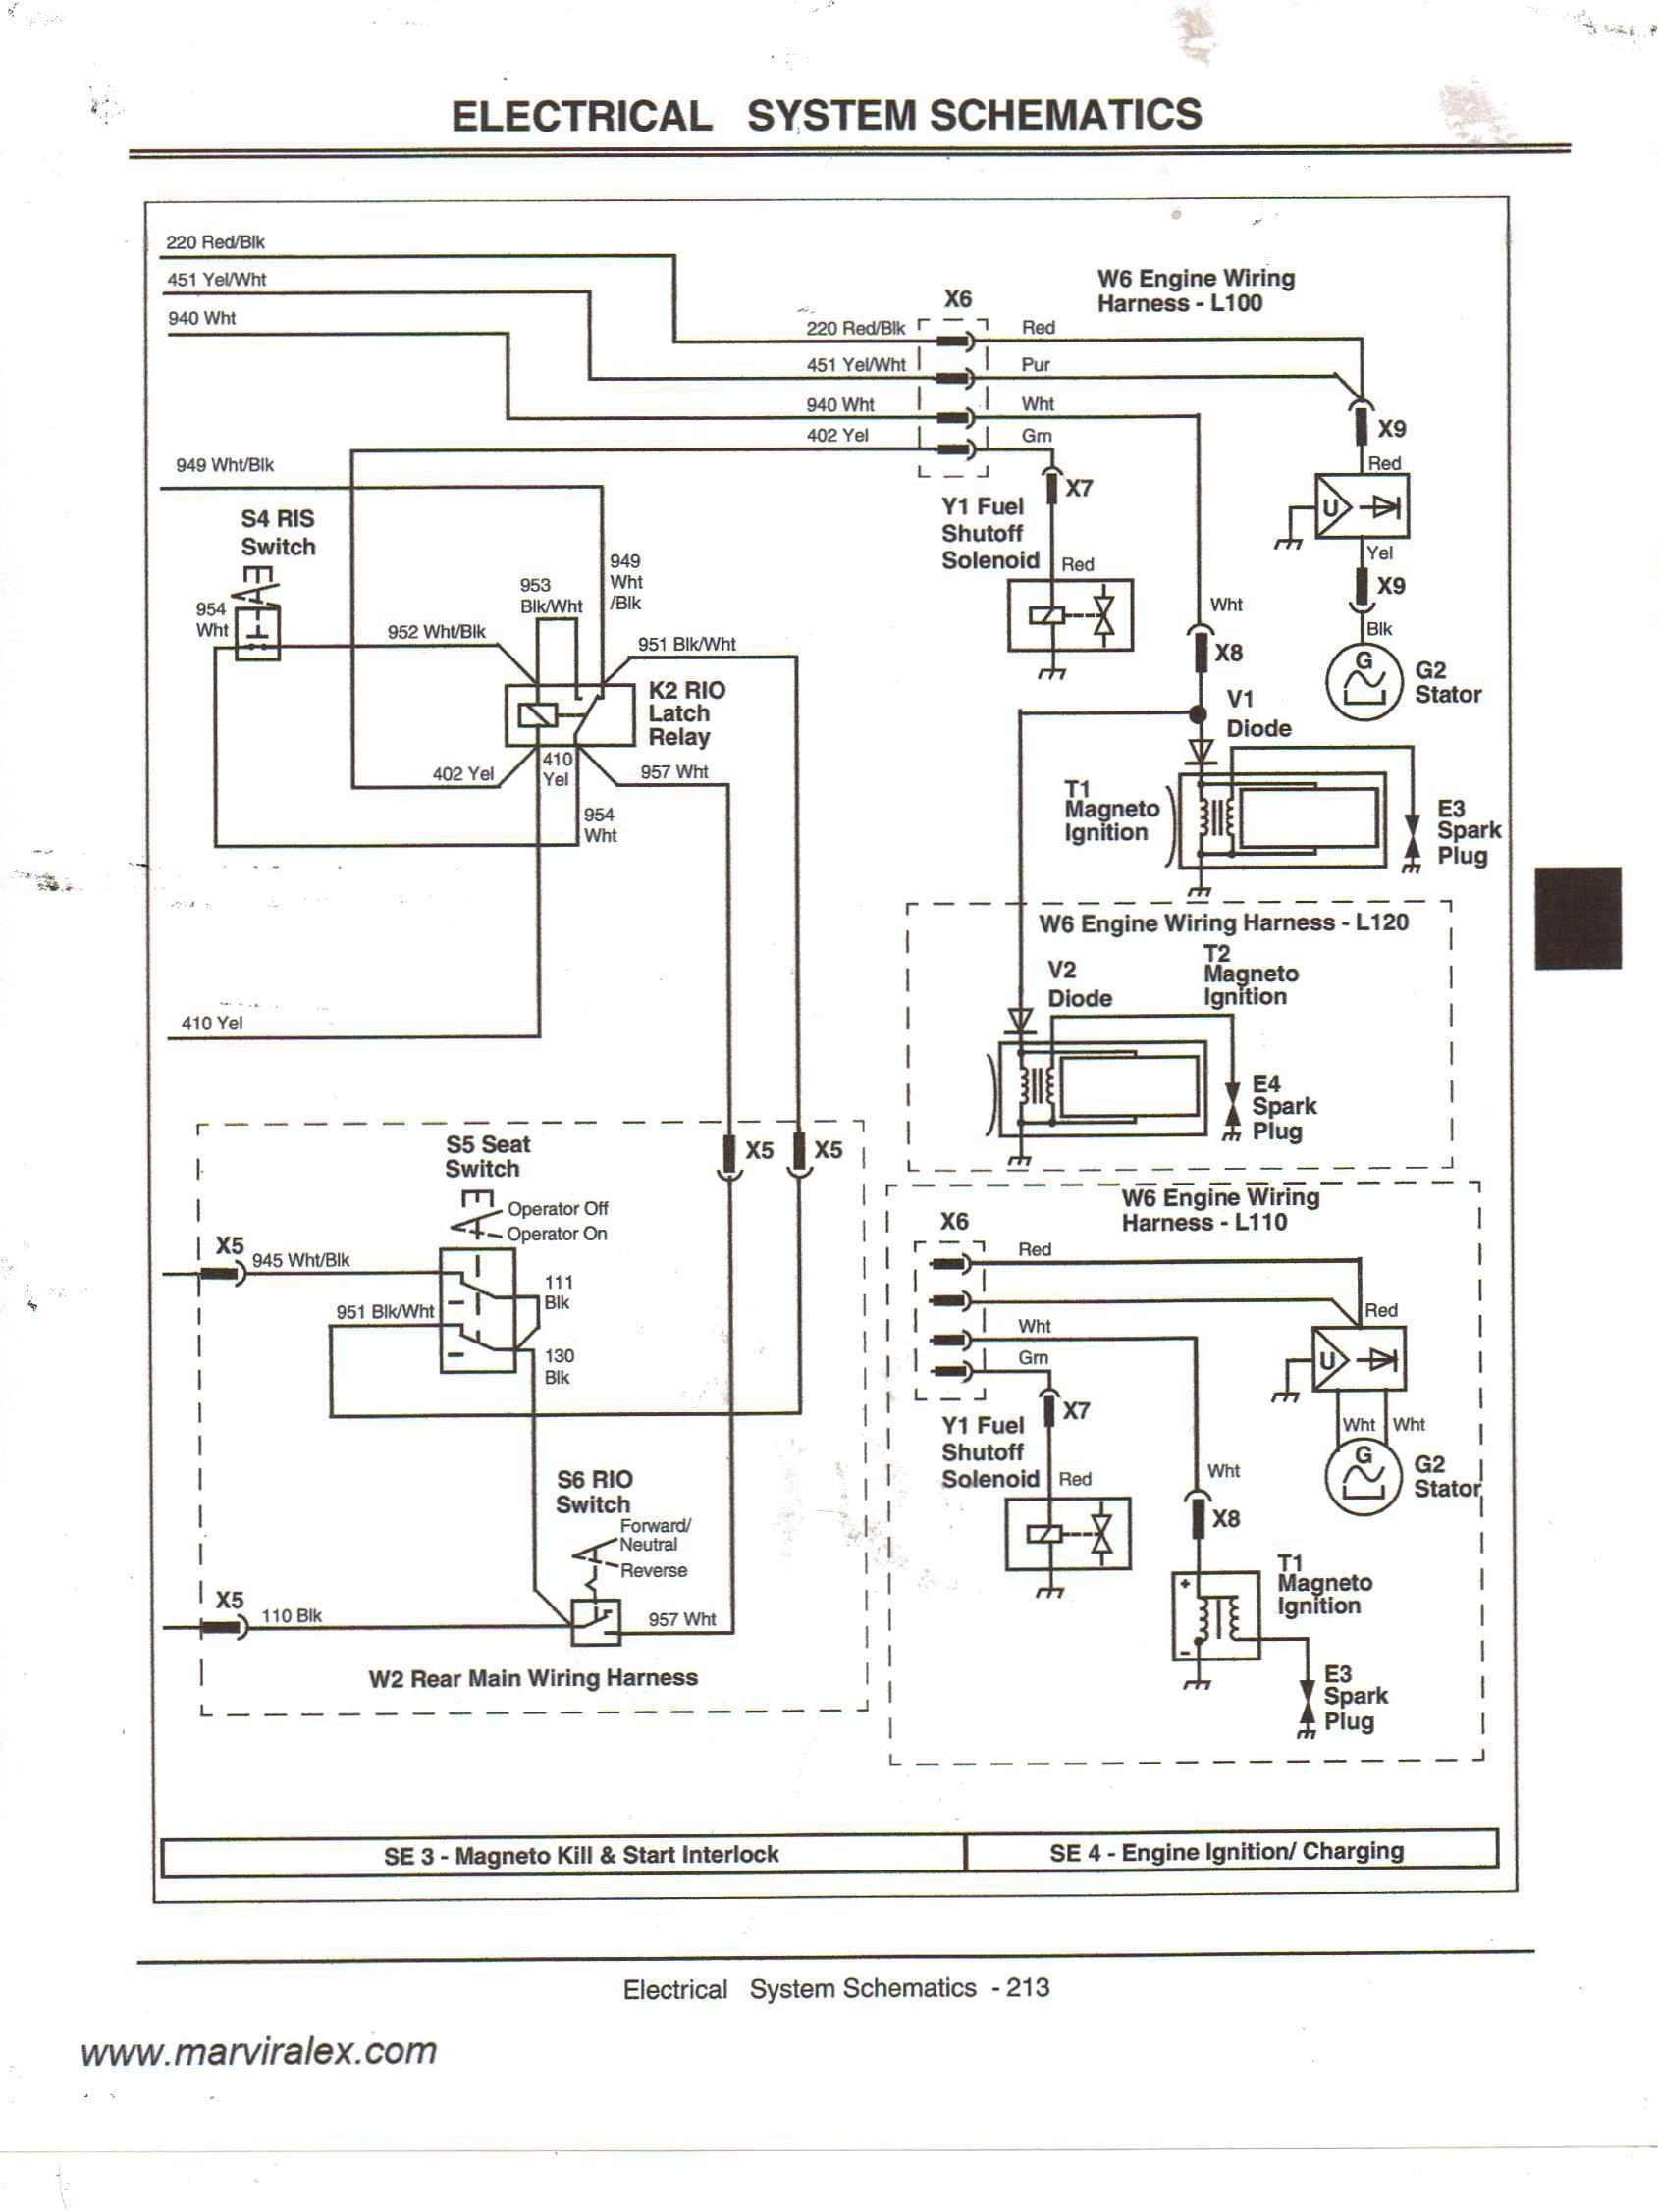 john deere f525 wiring schematic explore wiring diagram on the net